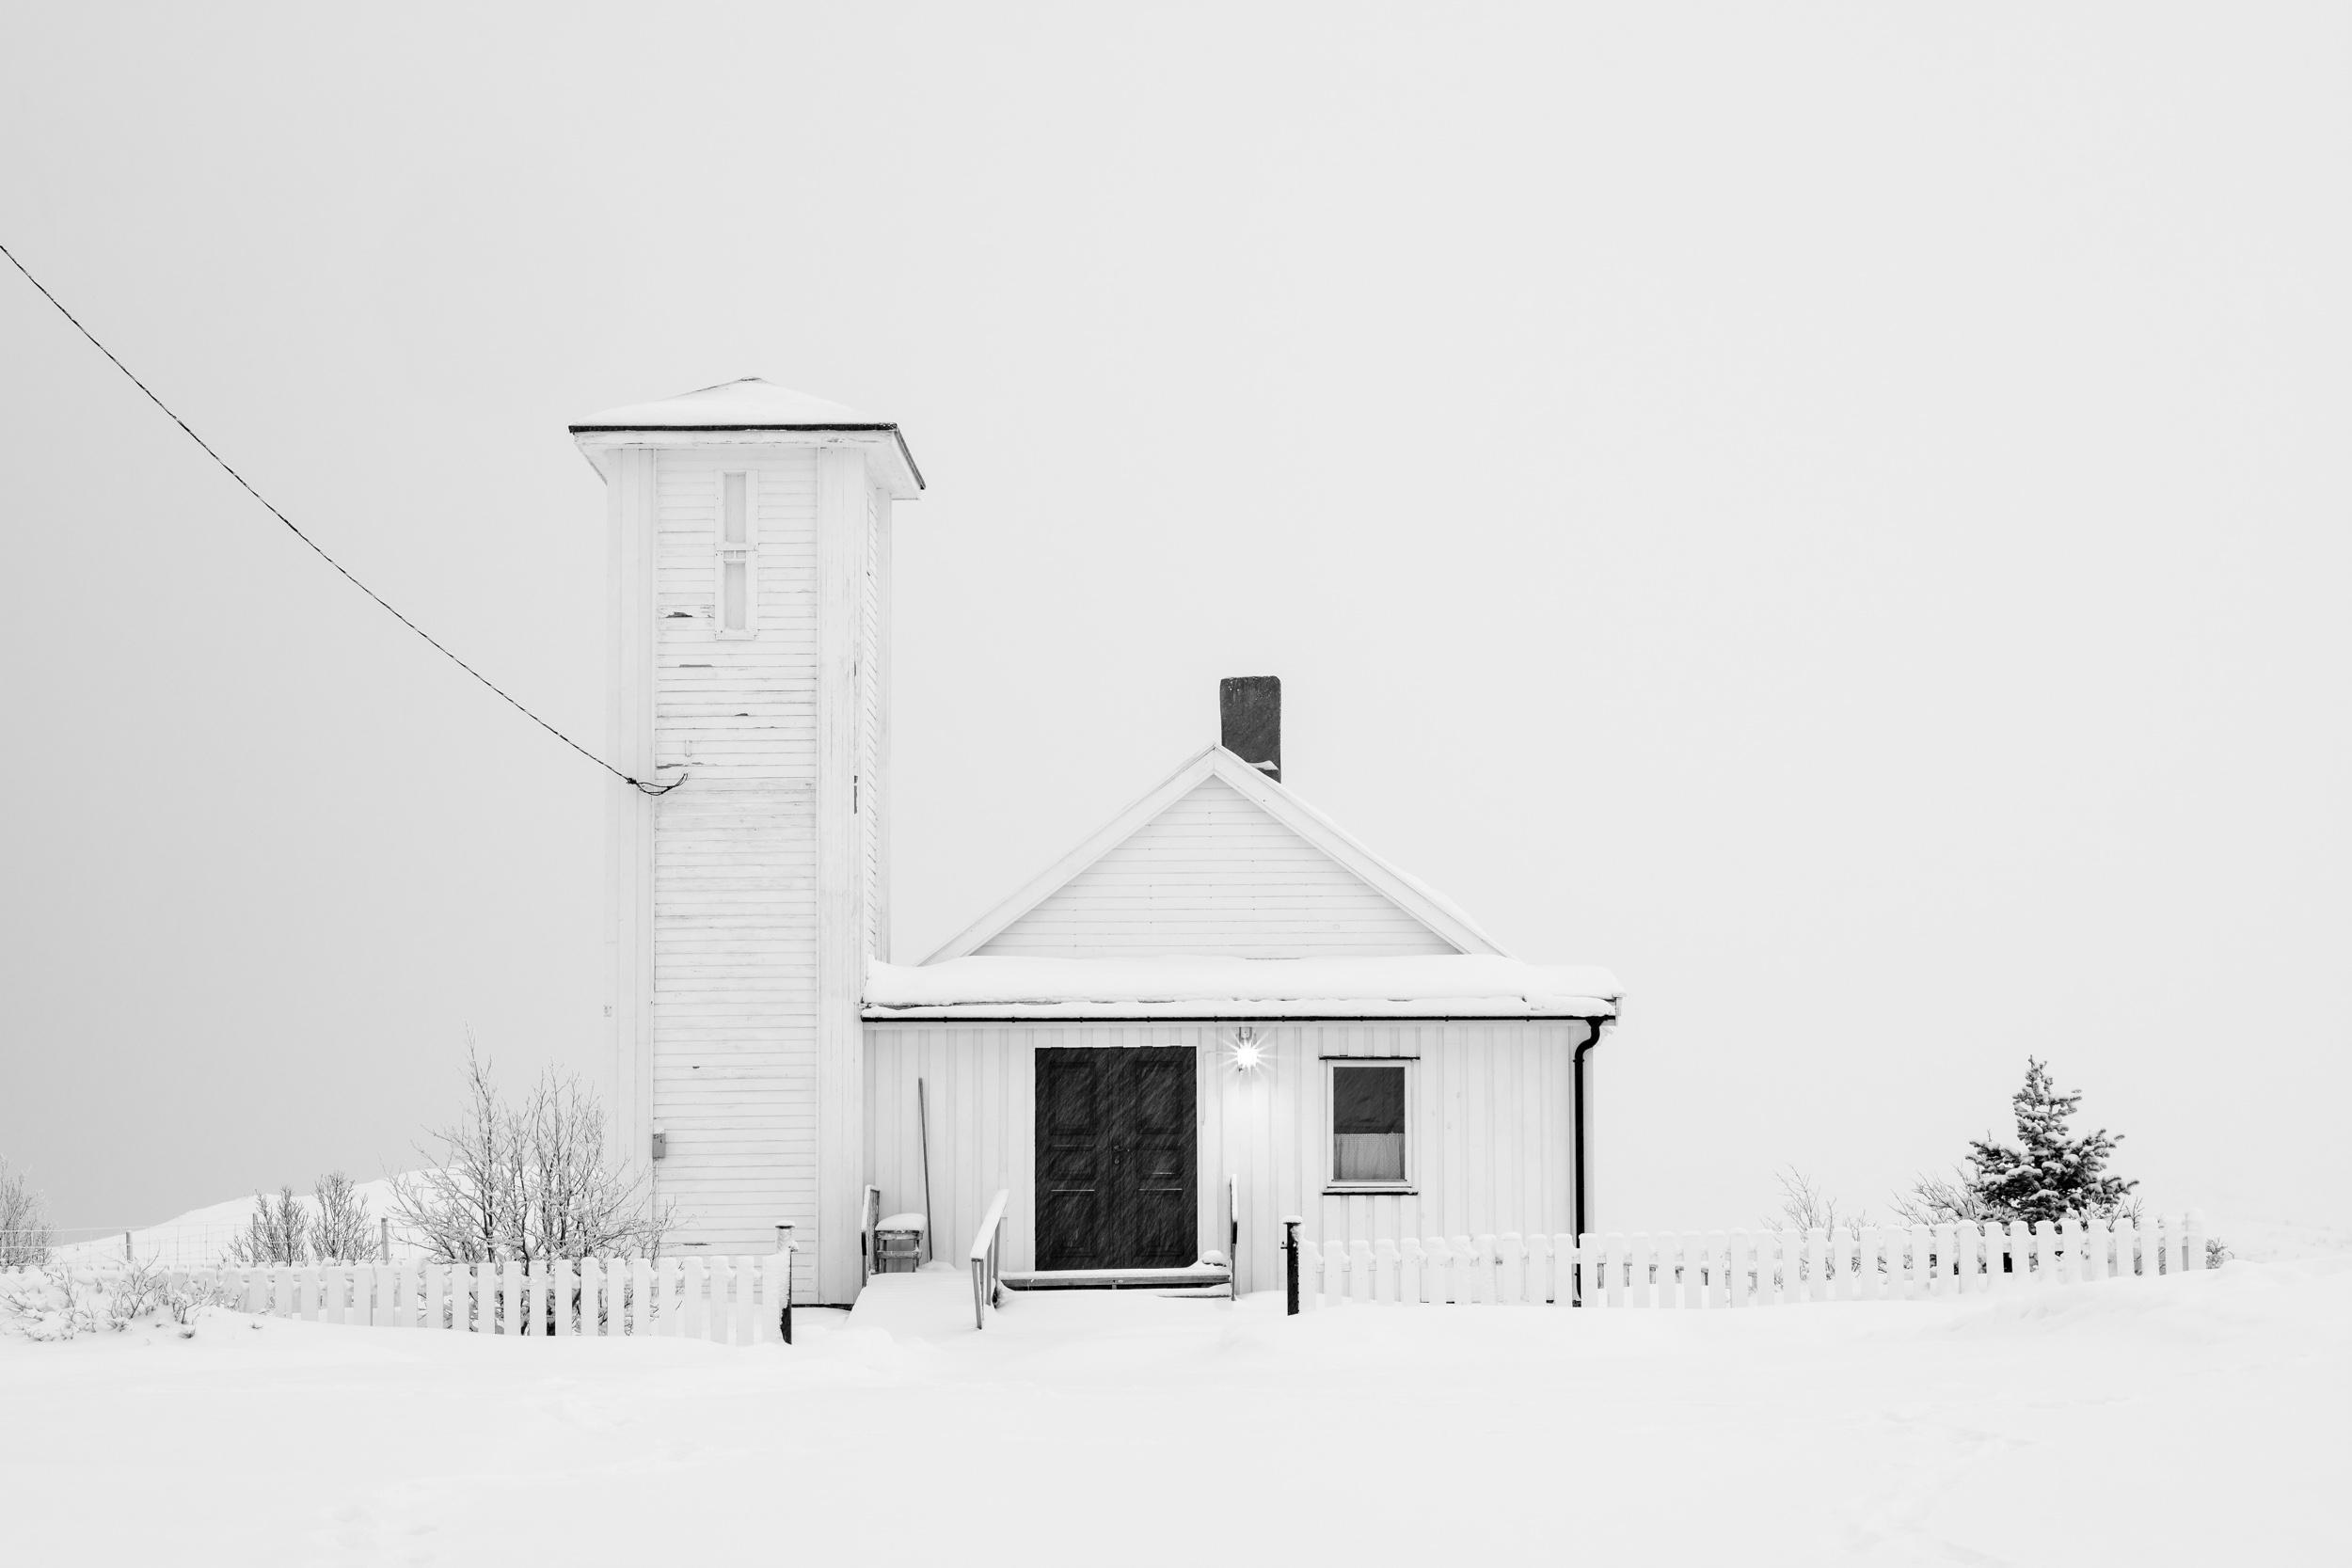 Chapel in Karlebotn / Fujifilm X-T3 ISO 160 56mm f/8.0 1/15sec